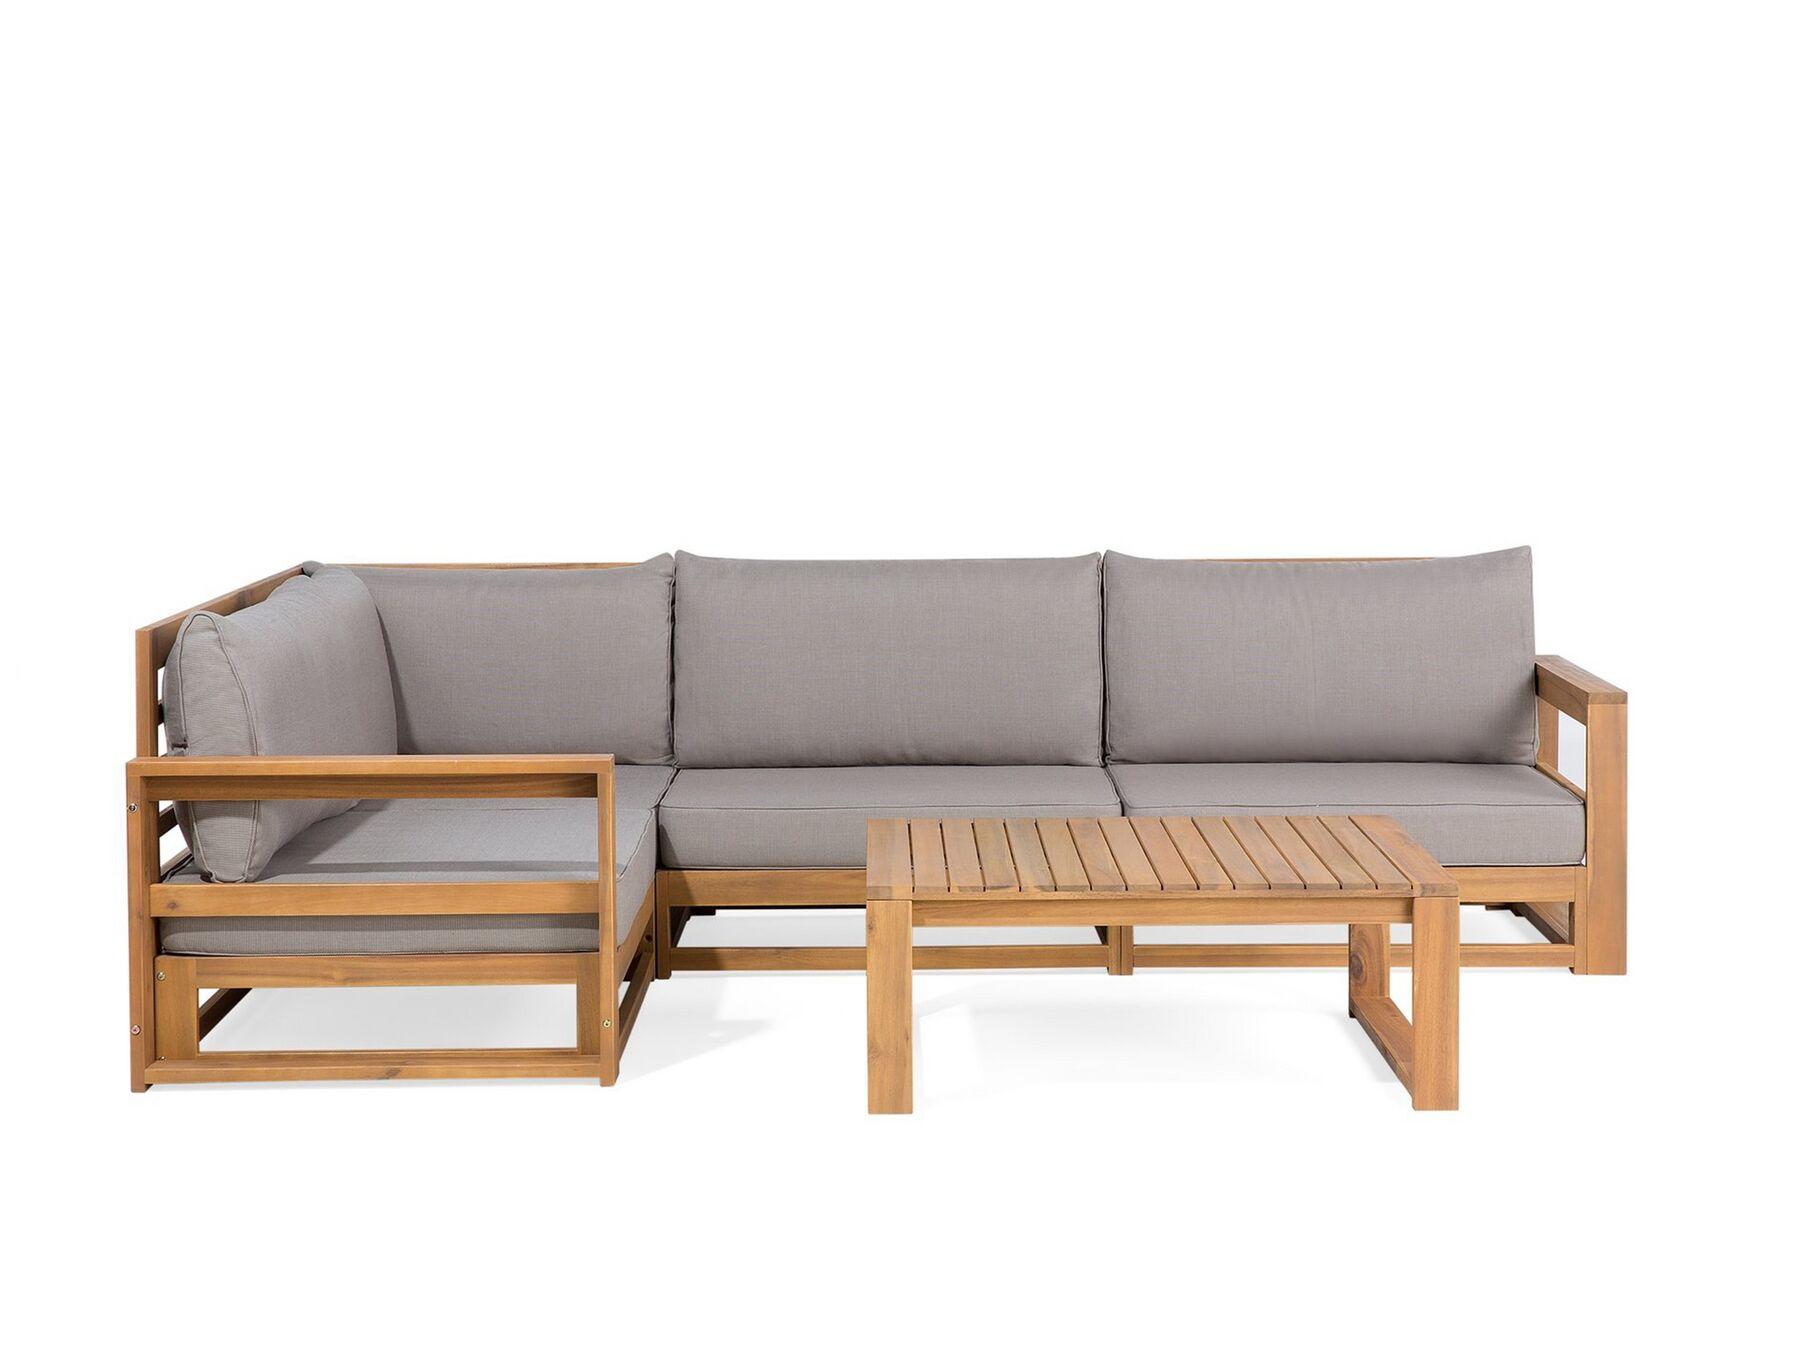 Full Size of Lounge Set Akazienhartholz Braun Timor Gartensofa Real Wohnzimmer Outliv Odense